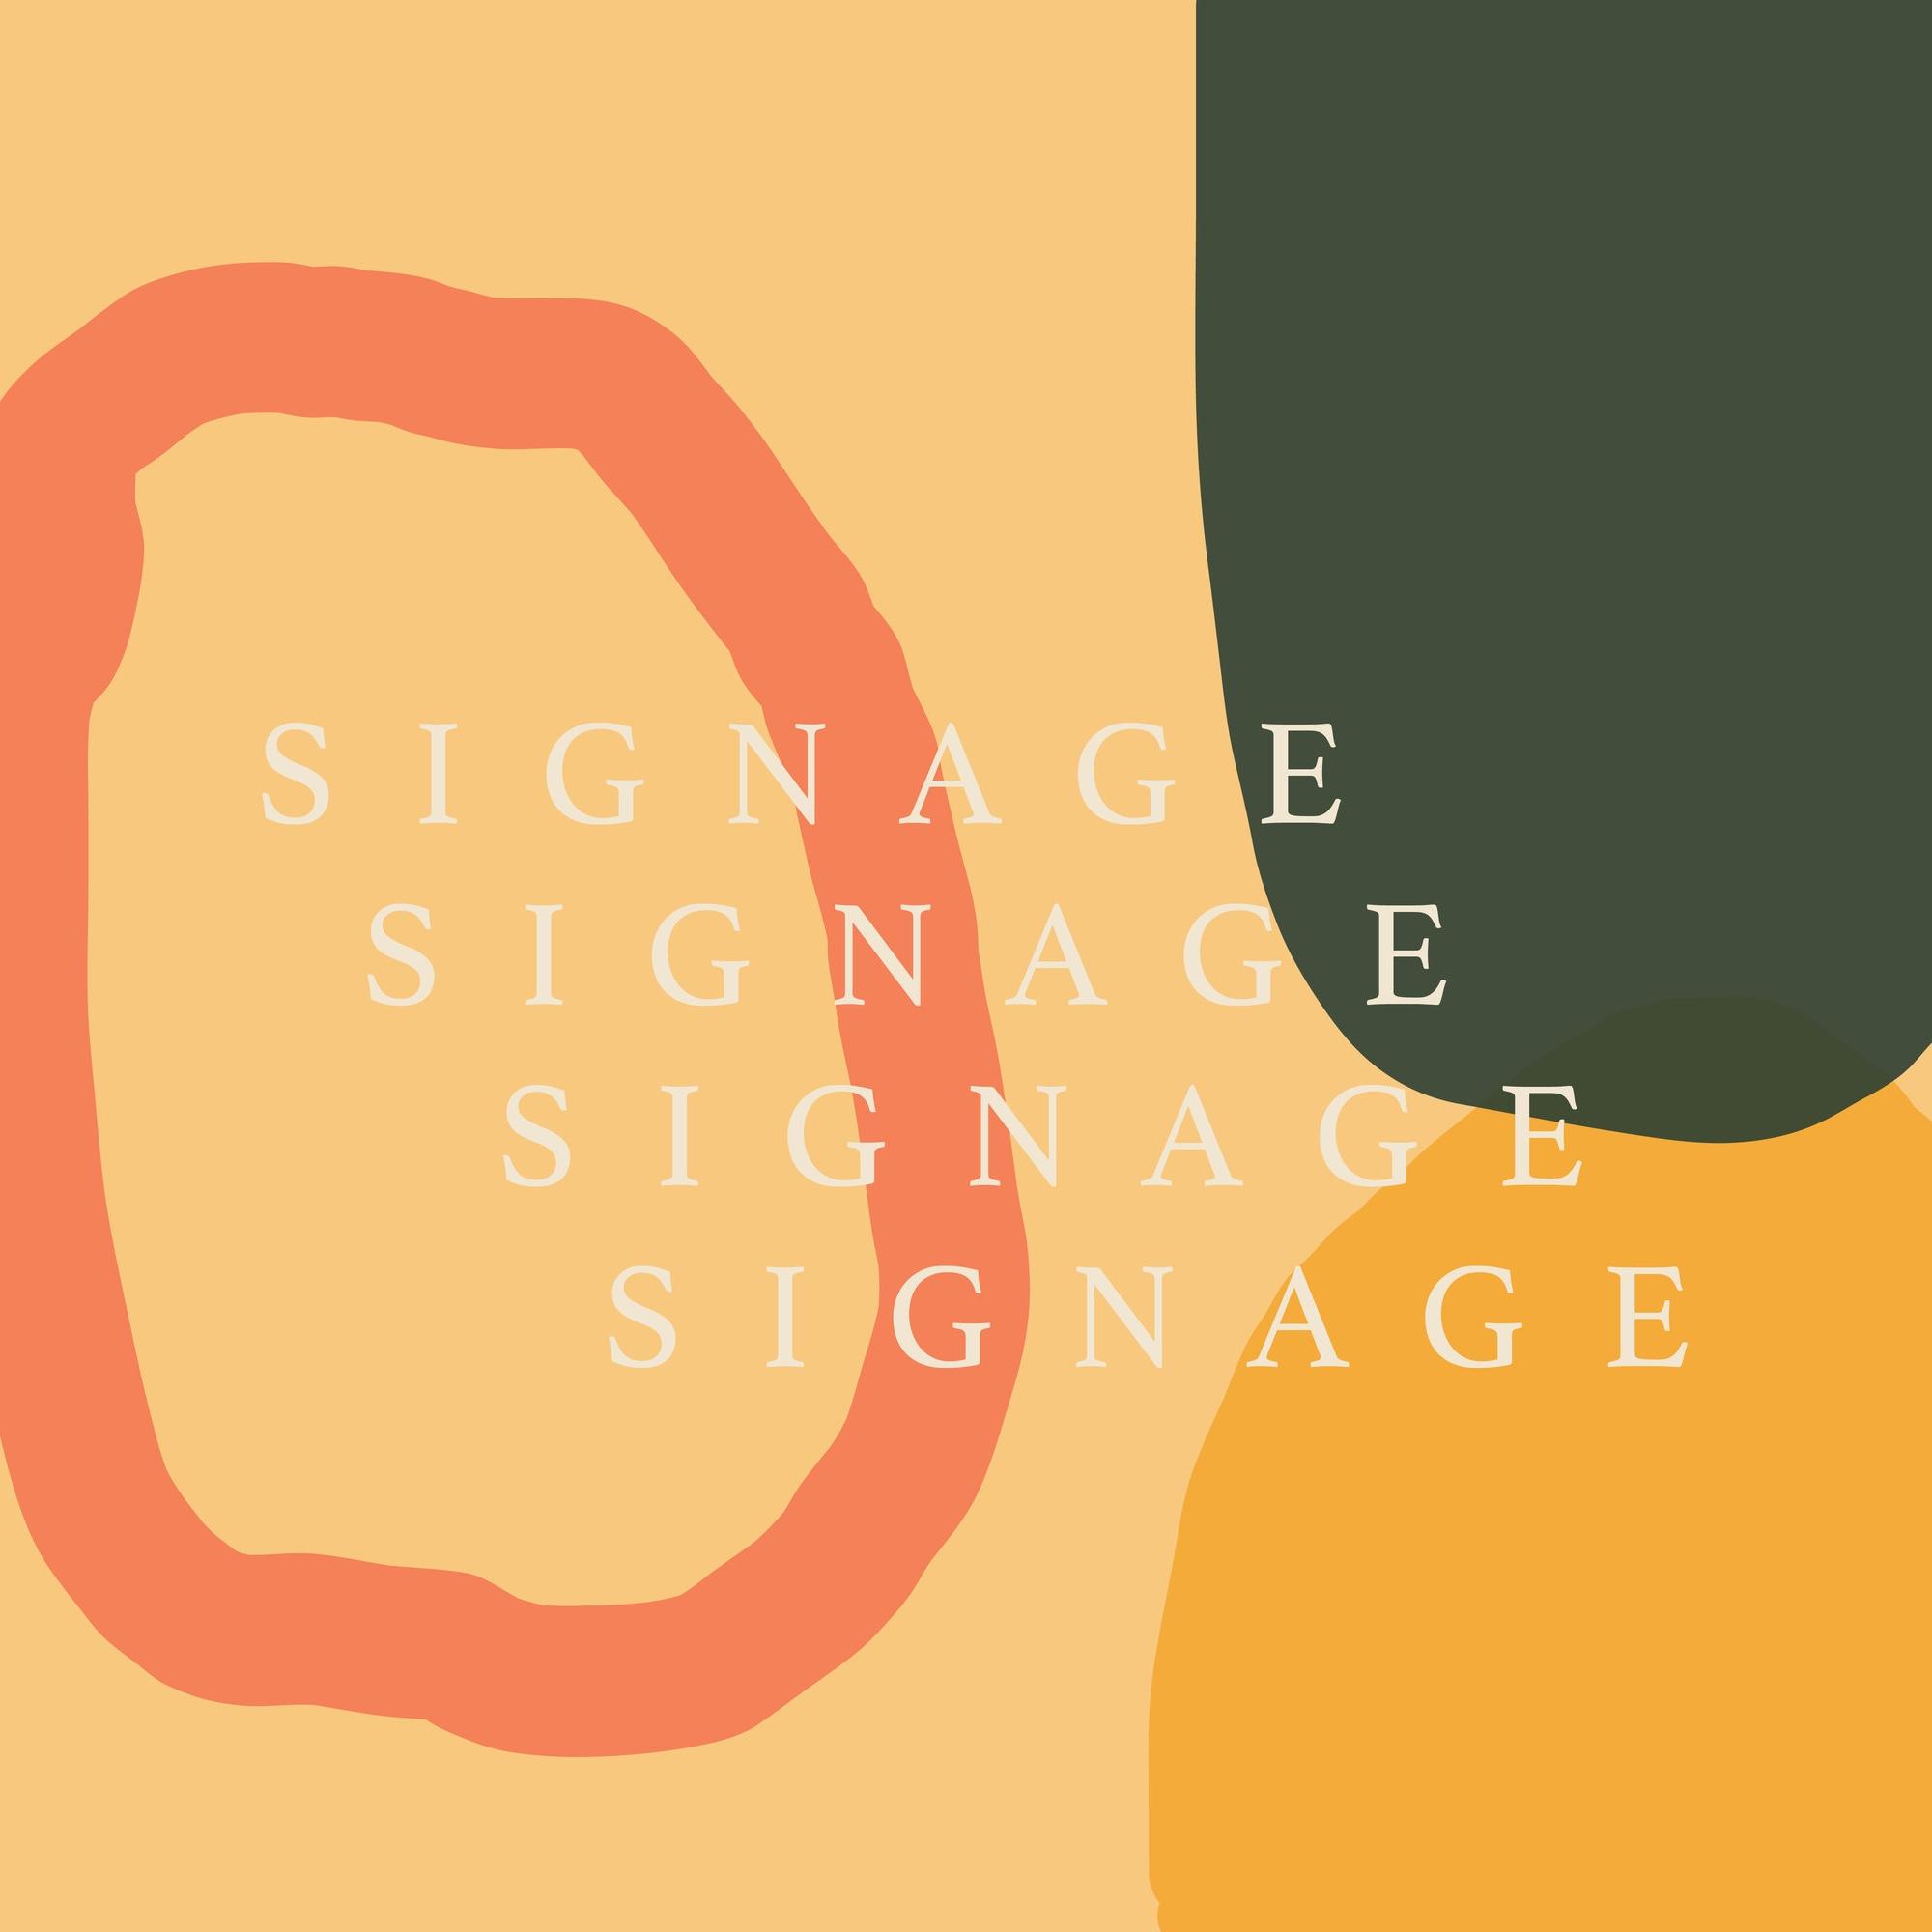 SignageCoverArt2-01.jpg